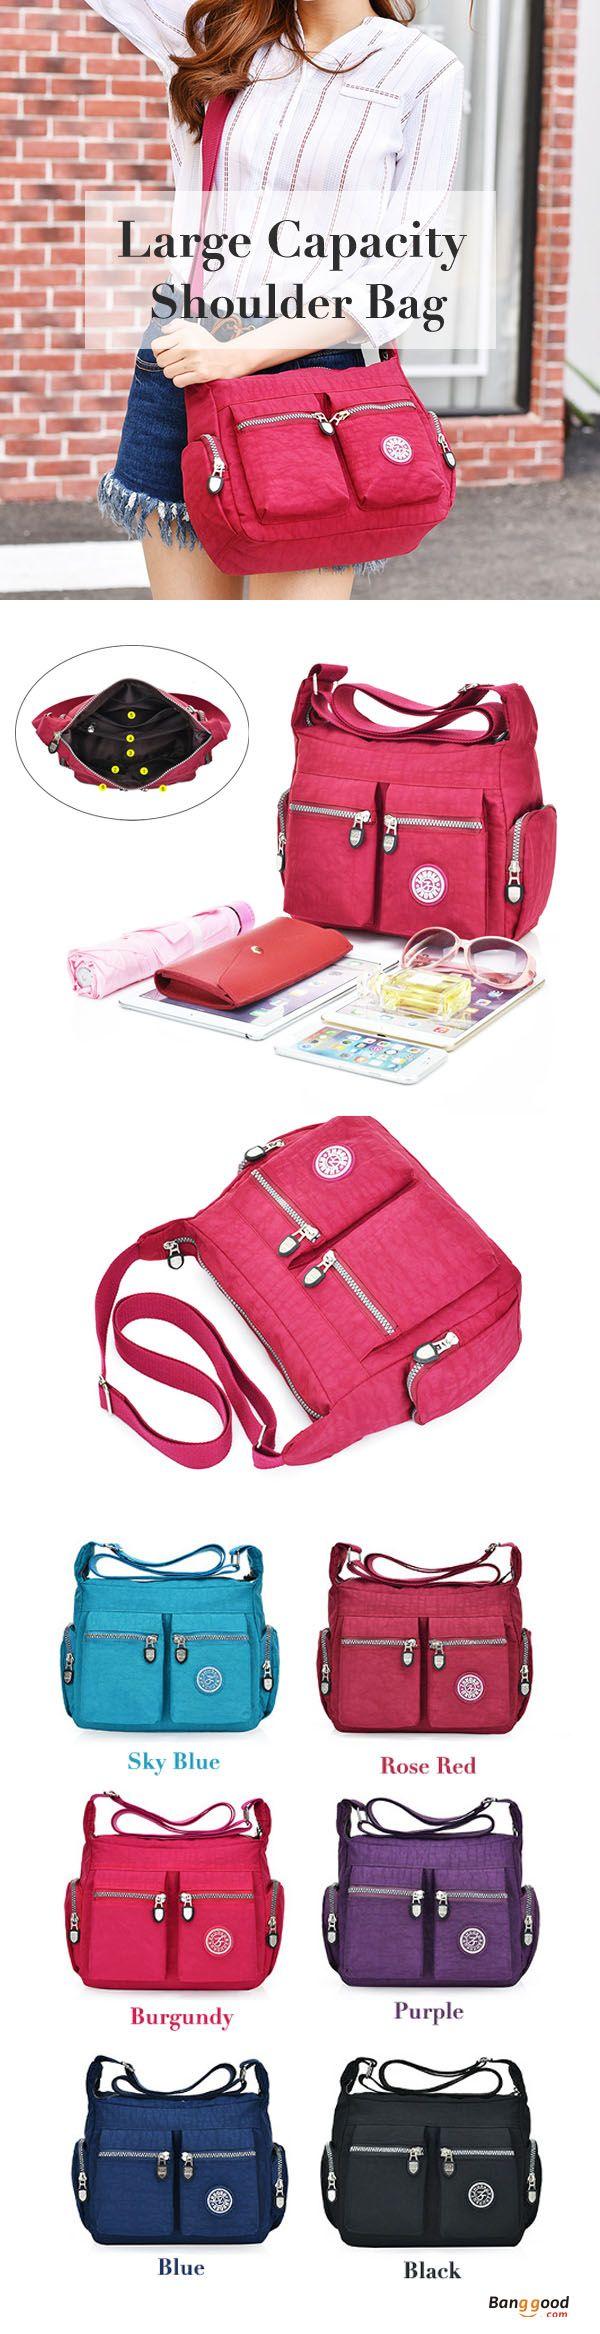 US$19.45+Free shipping. Women Bags, Waterproof Crossbody Bags, Casual Bags, Chest Bags, Multifunction Handbag, Backpack, Shoulder Bags. Waterproof, Large Capacity. Color: Black, Blue, Purple, Sky Blue, Rose Red, Burgundy.